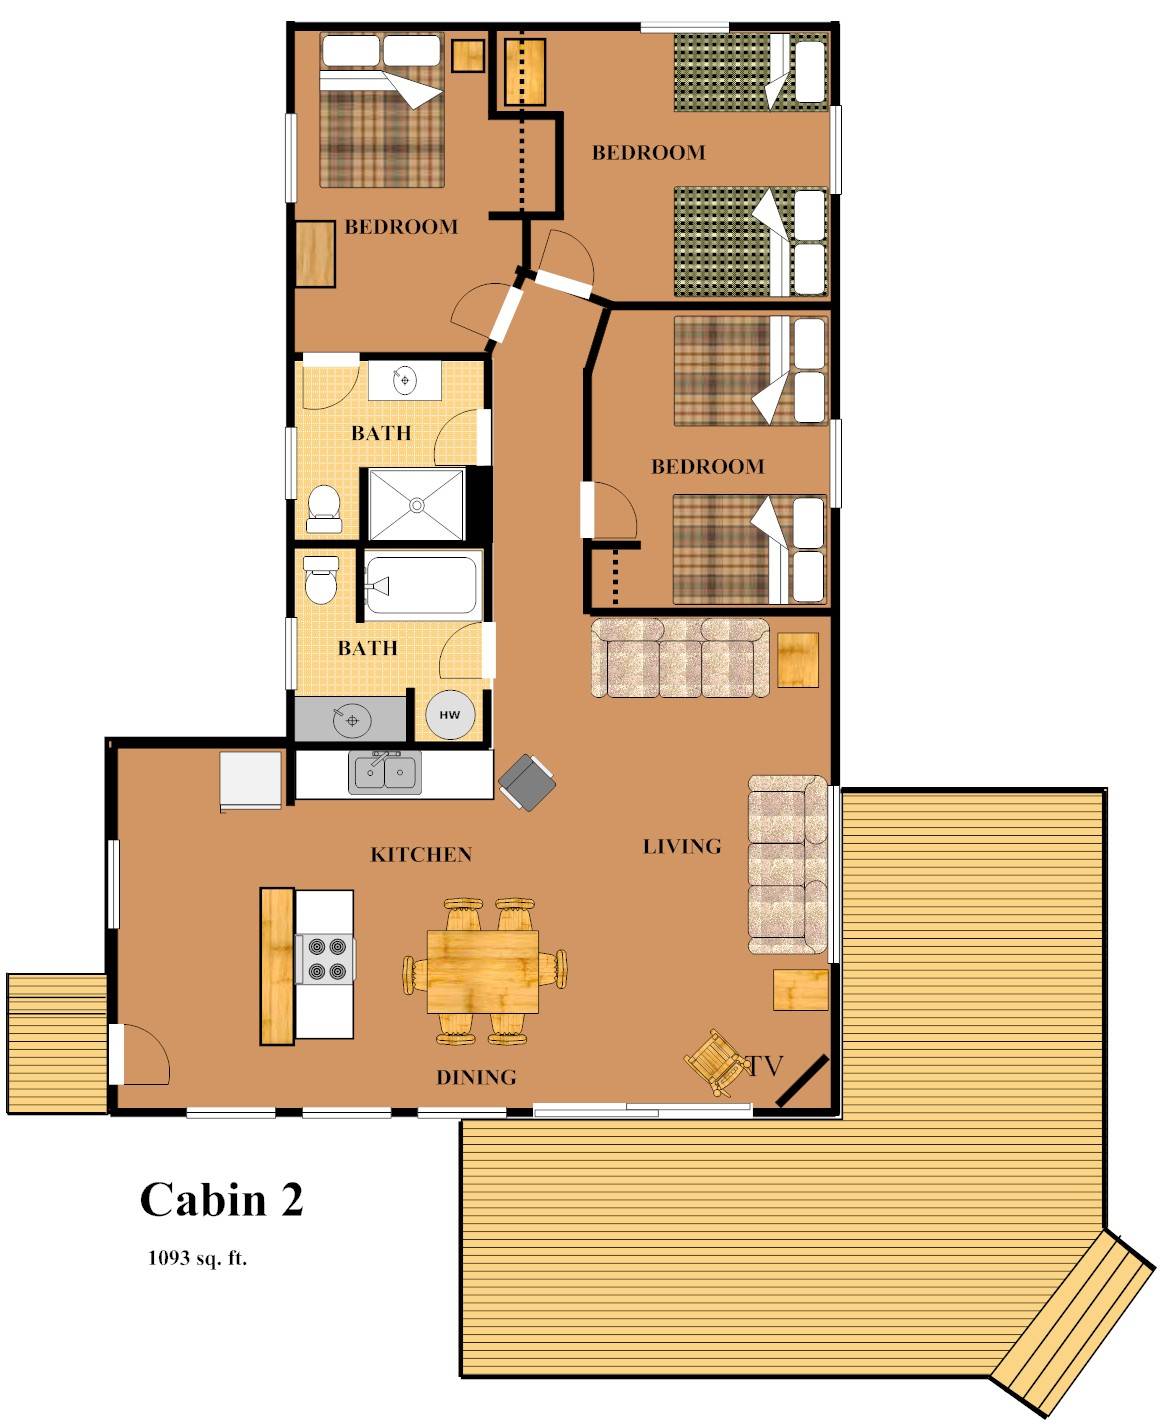 Cabin 2 big rock resort leech lake minnesota for Minnesota lake home floor plans